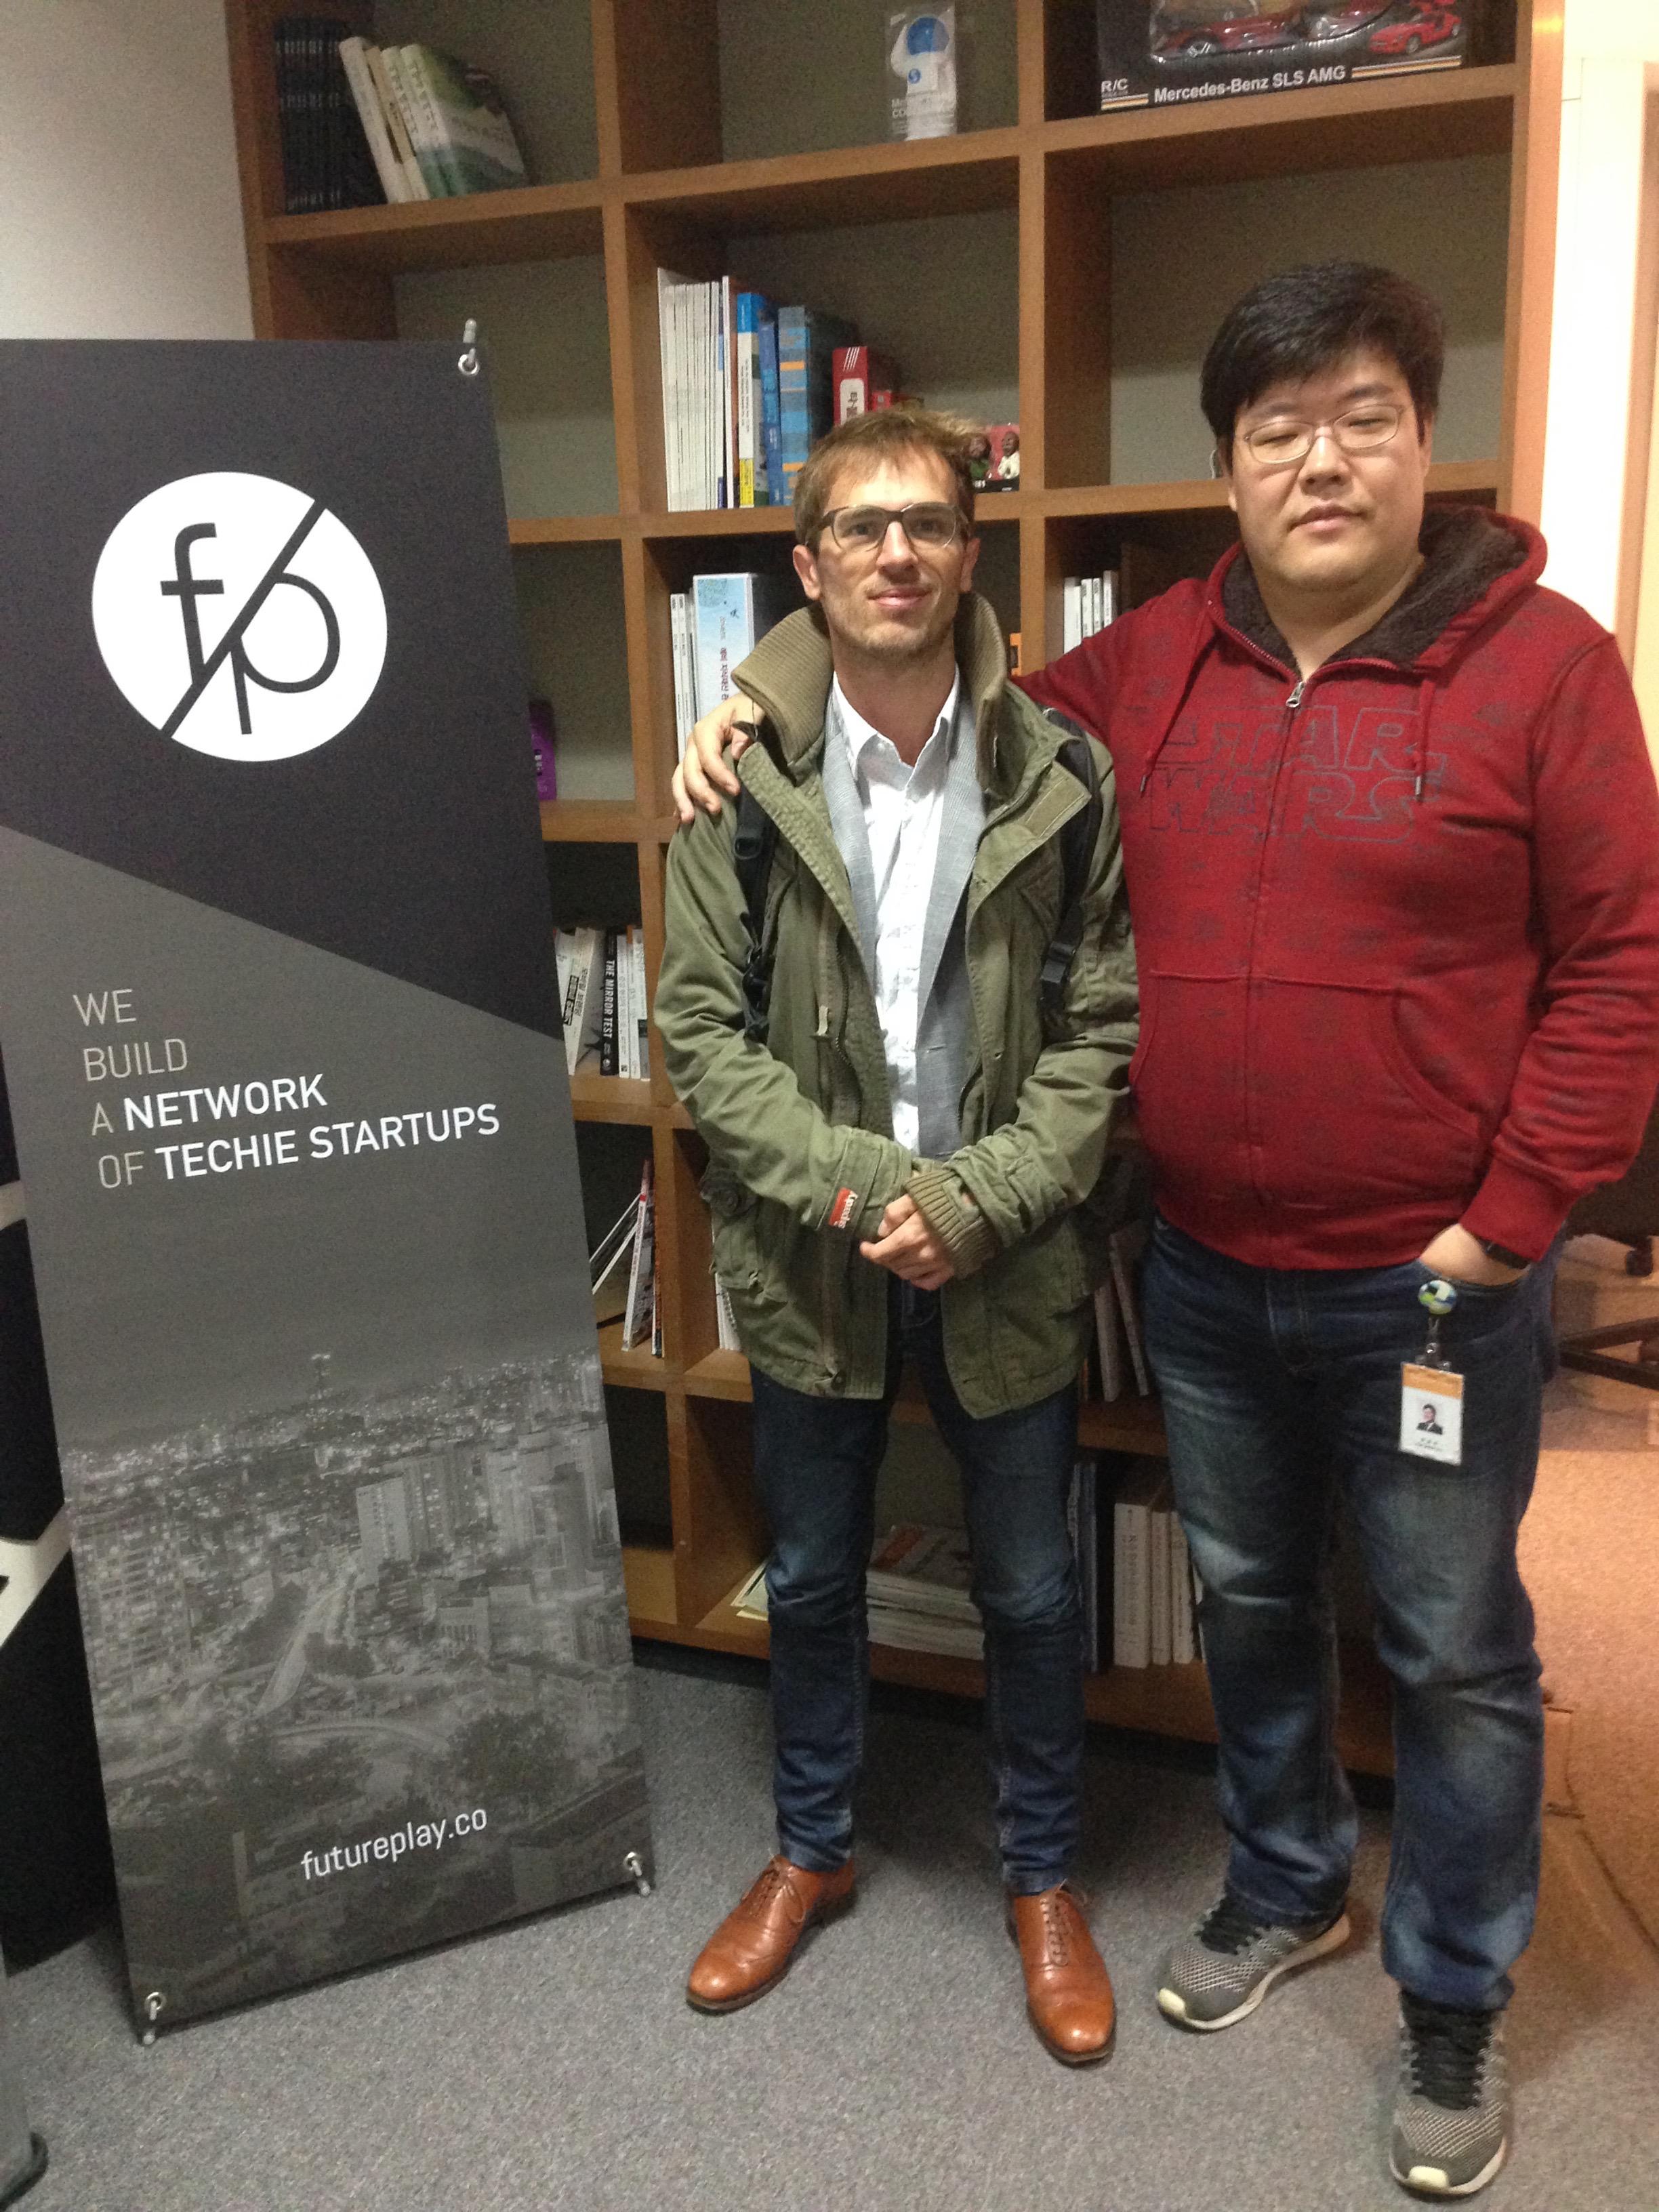 South Korea accelerator FuturePlay co-founder Jung-Hee Ryu with Martin PAsquier